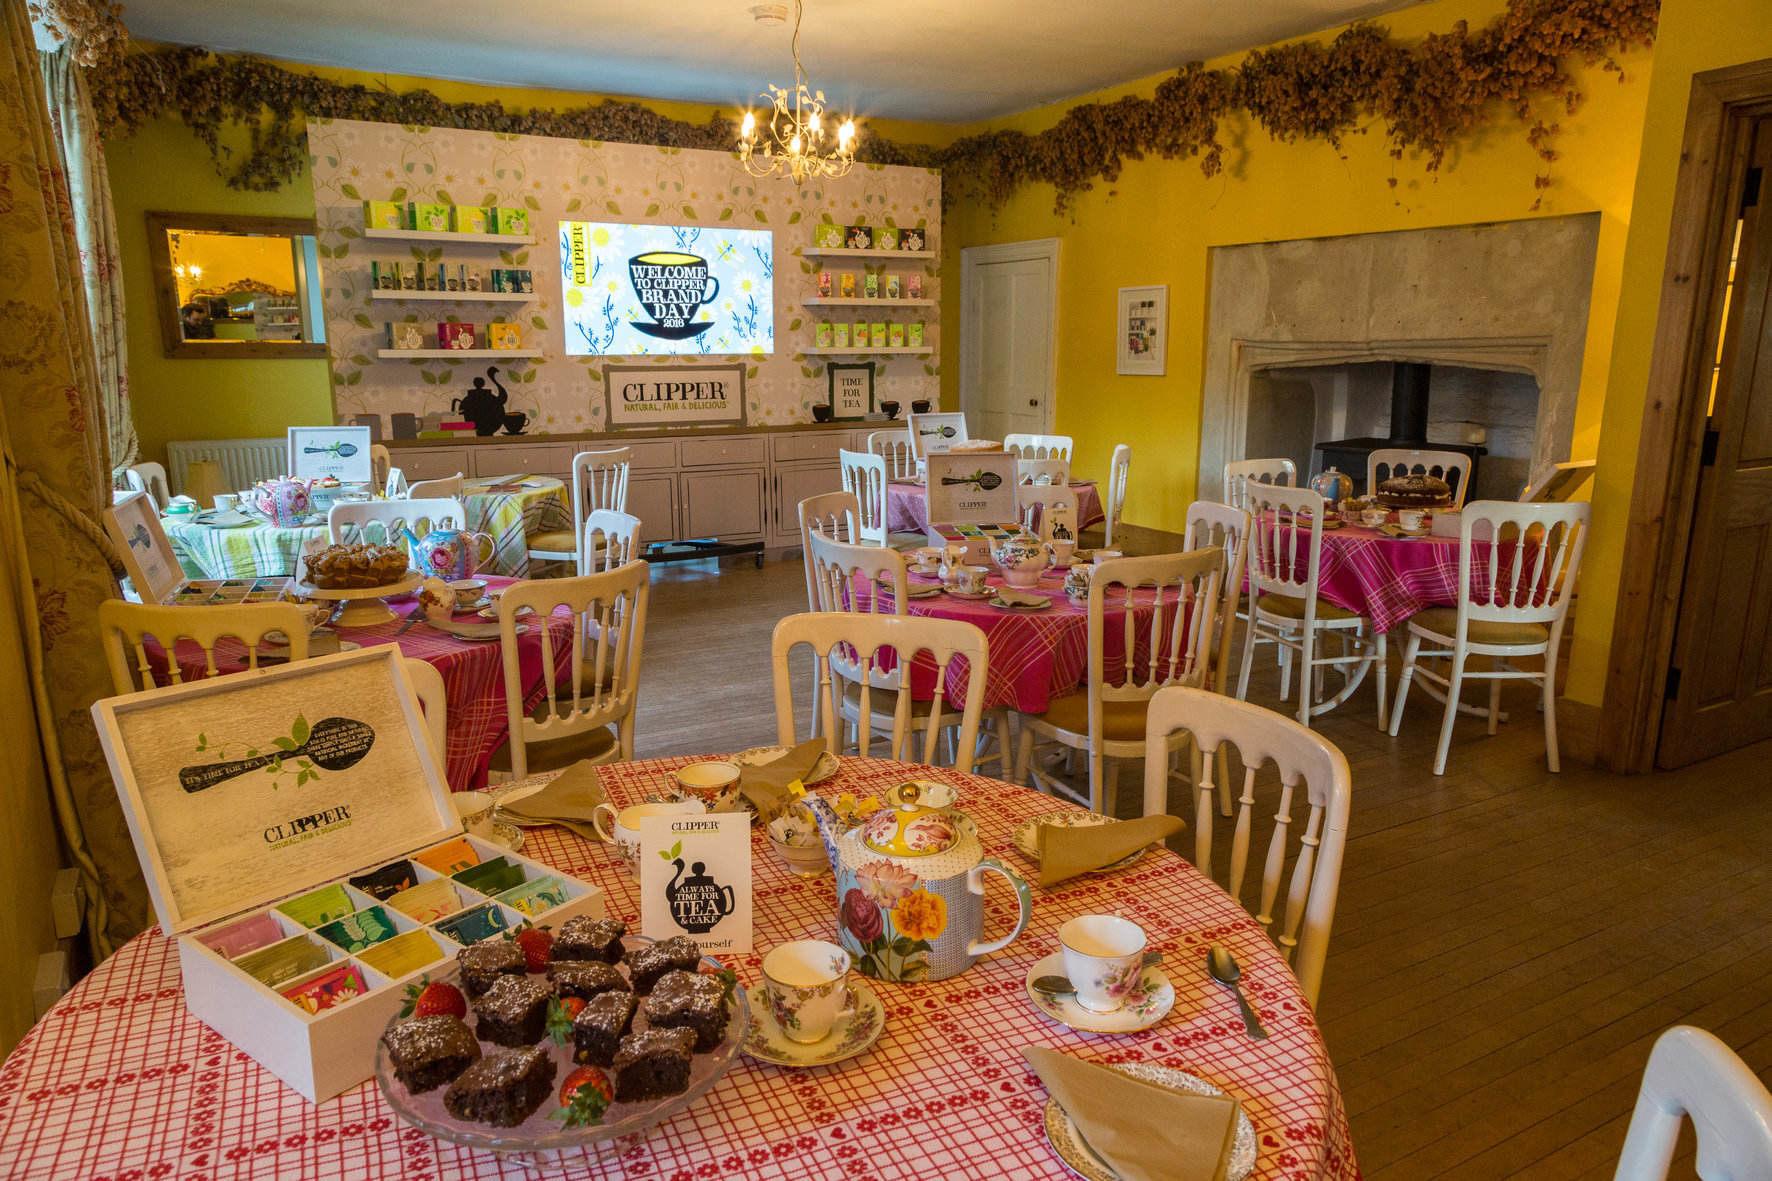 Clipper Teas in the Tea Room at Huntstile Farm